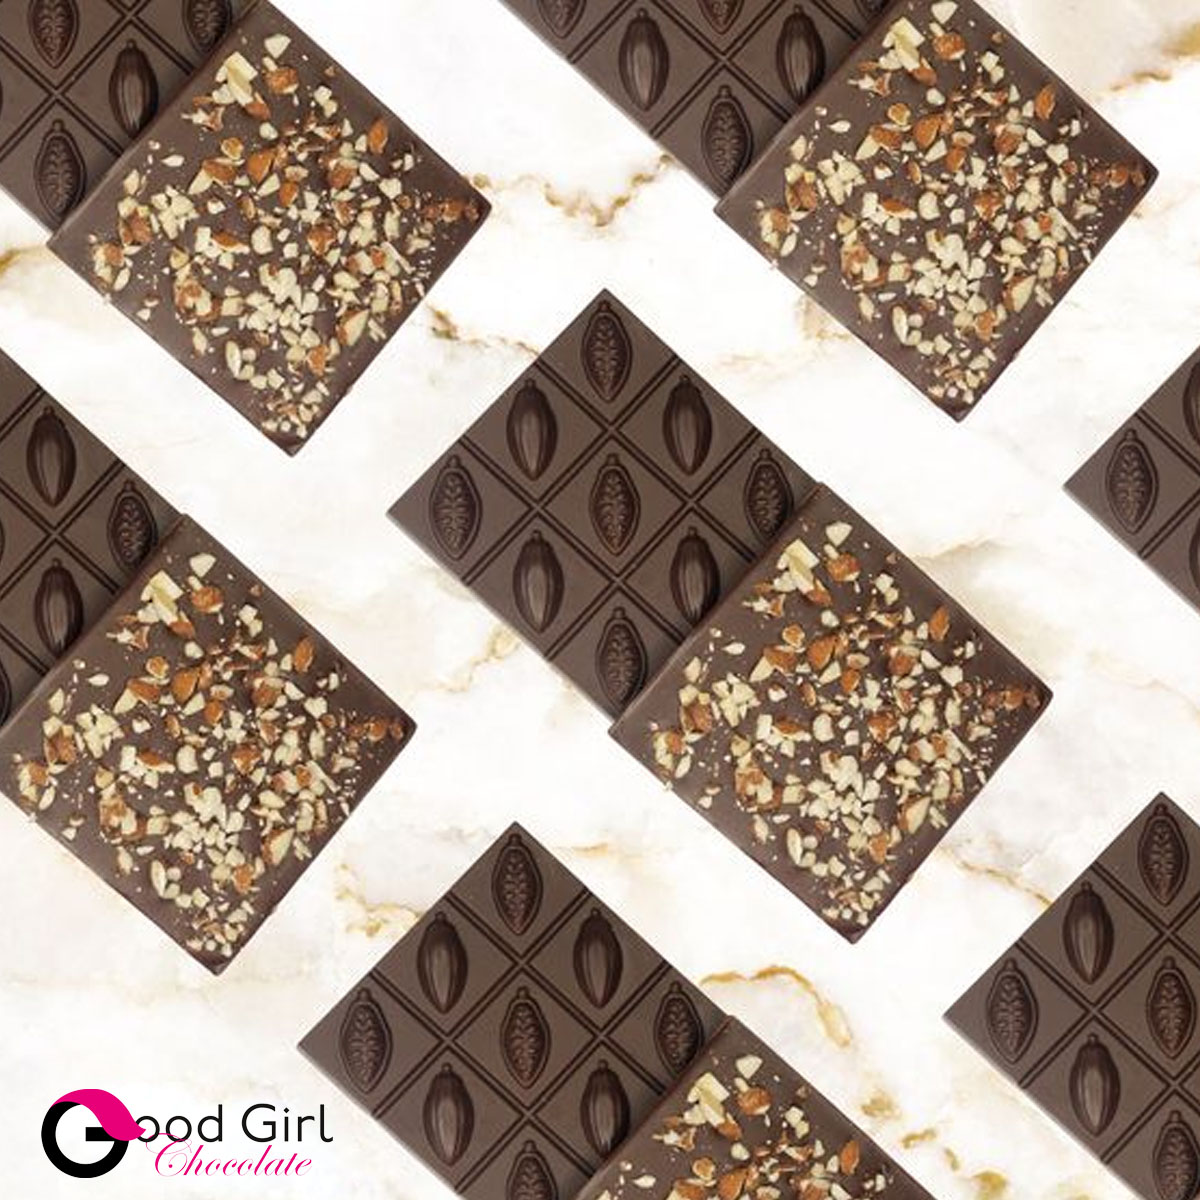 Penn Square Mall - Promo - Good Girl Chocolate image